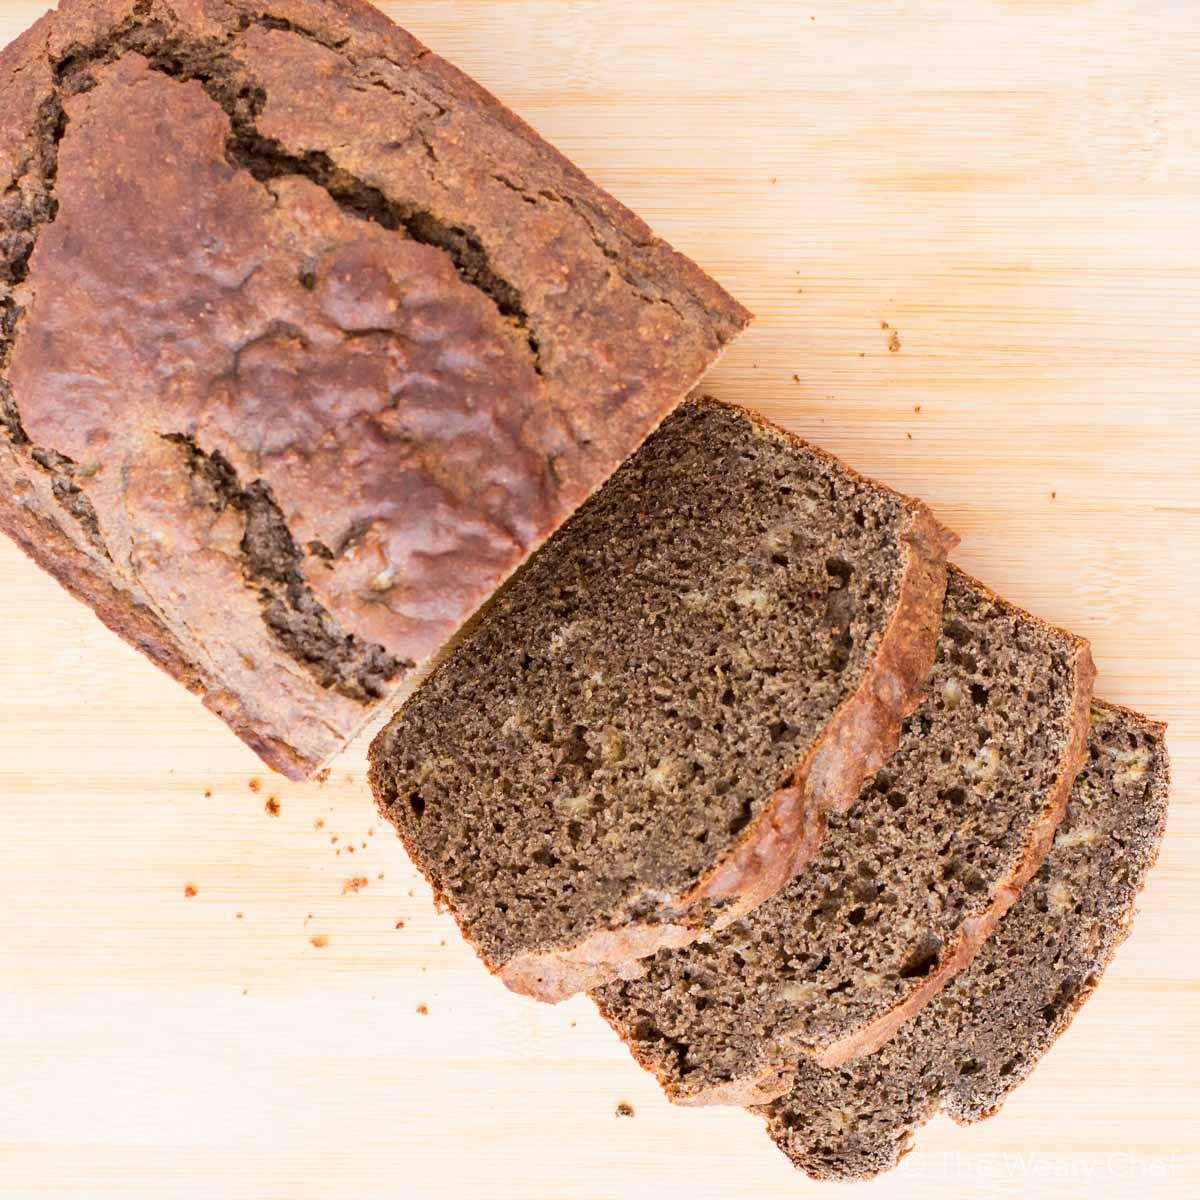 Healthy Banana Bread No Flour  Healthy Banana Bread Recipe with Buckwheat Flour The